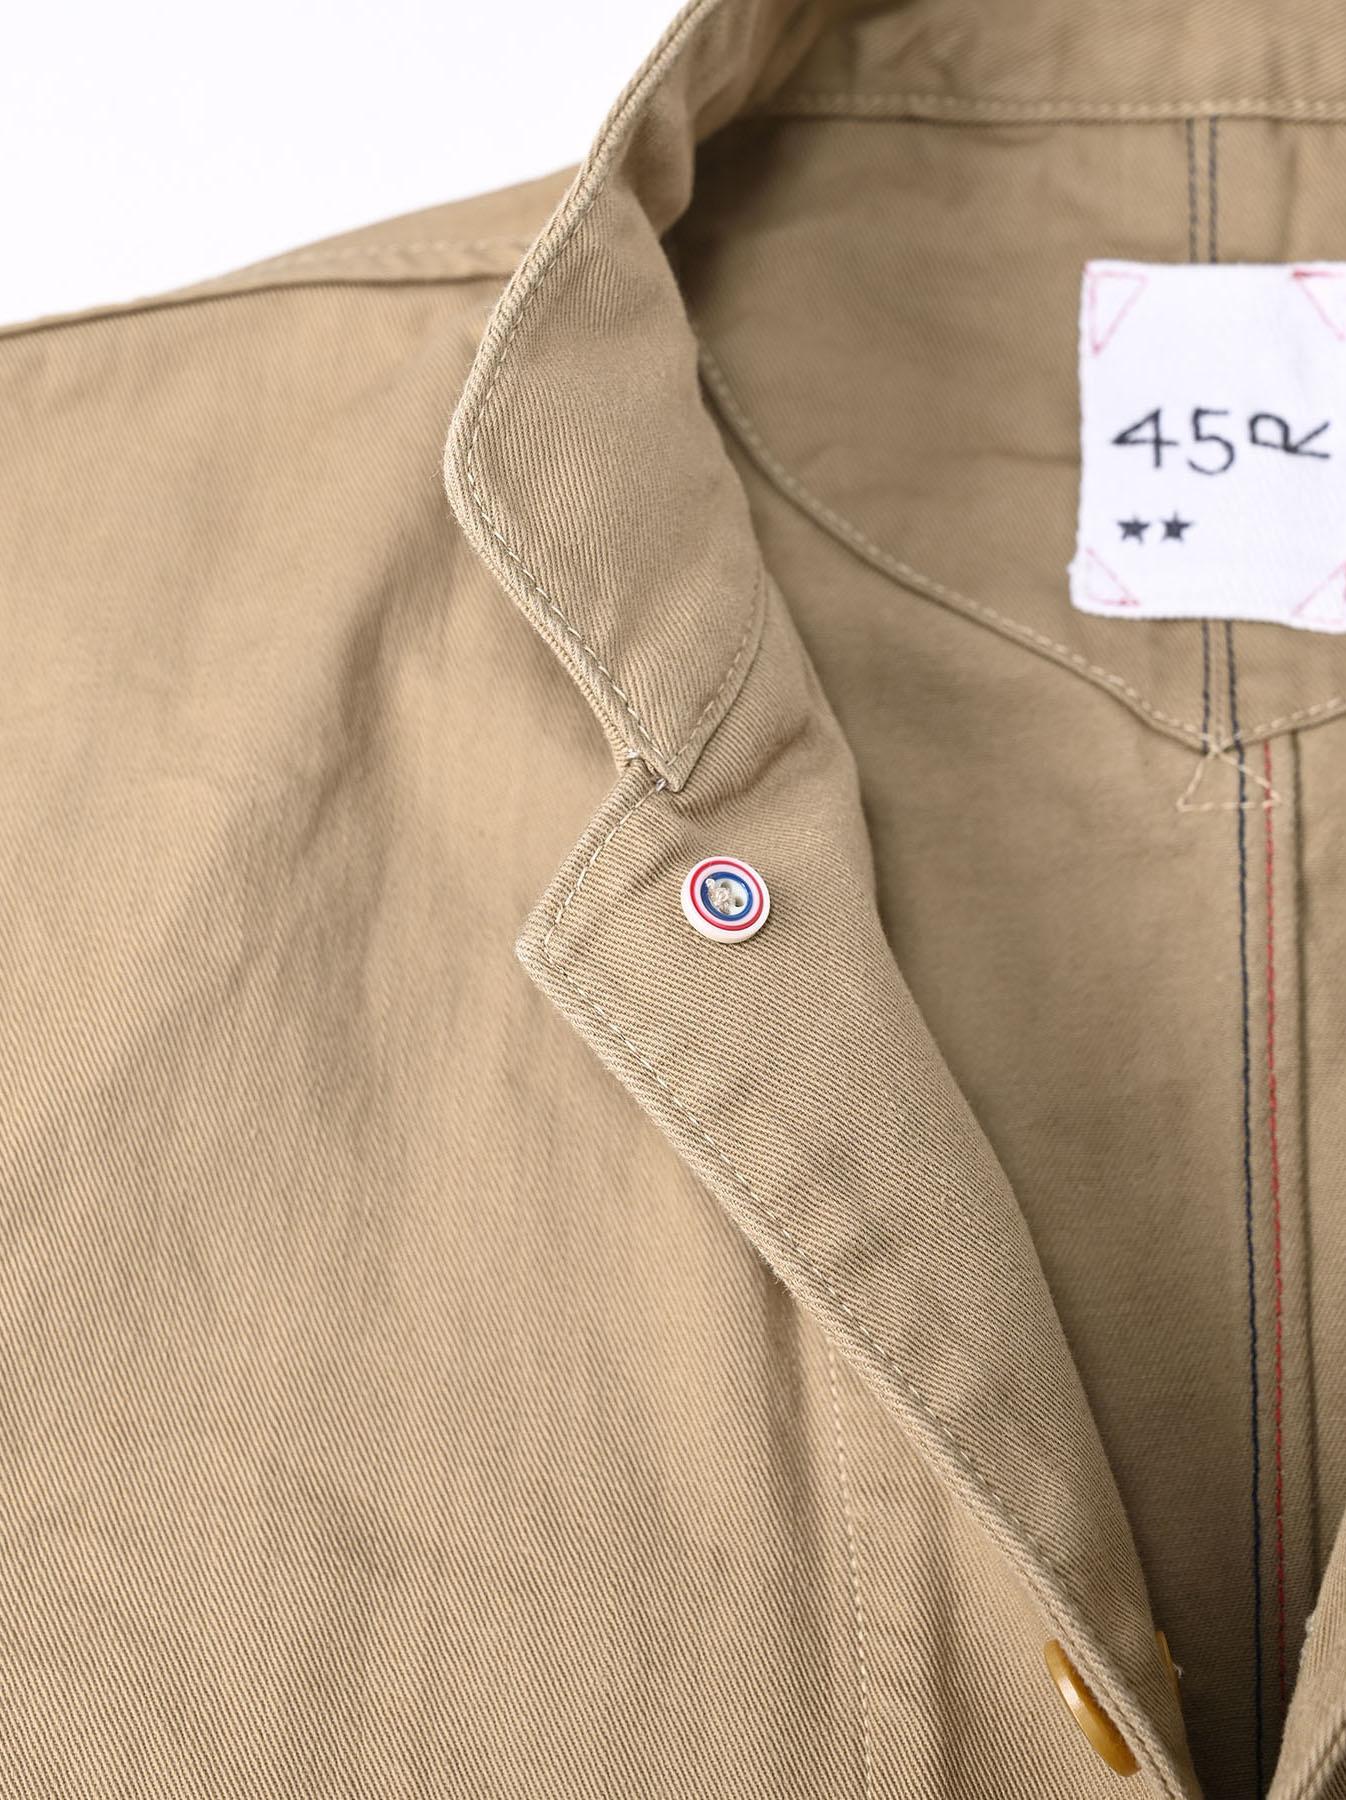 Okome Chino 908 Shirt Jacket-11